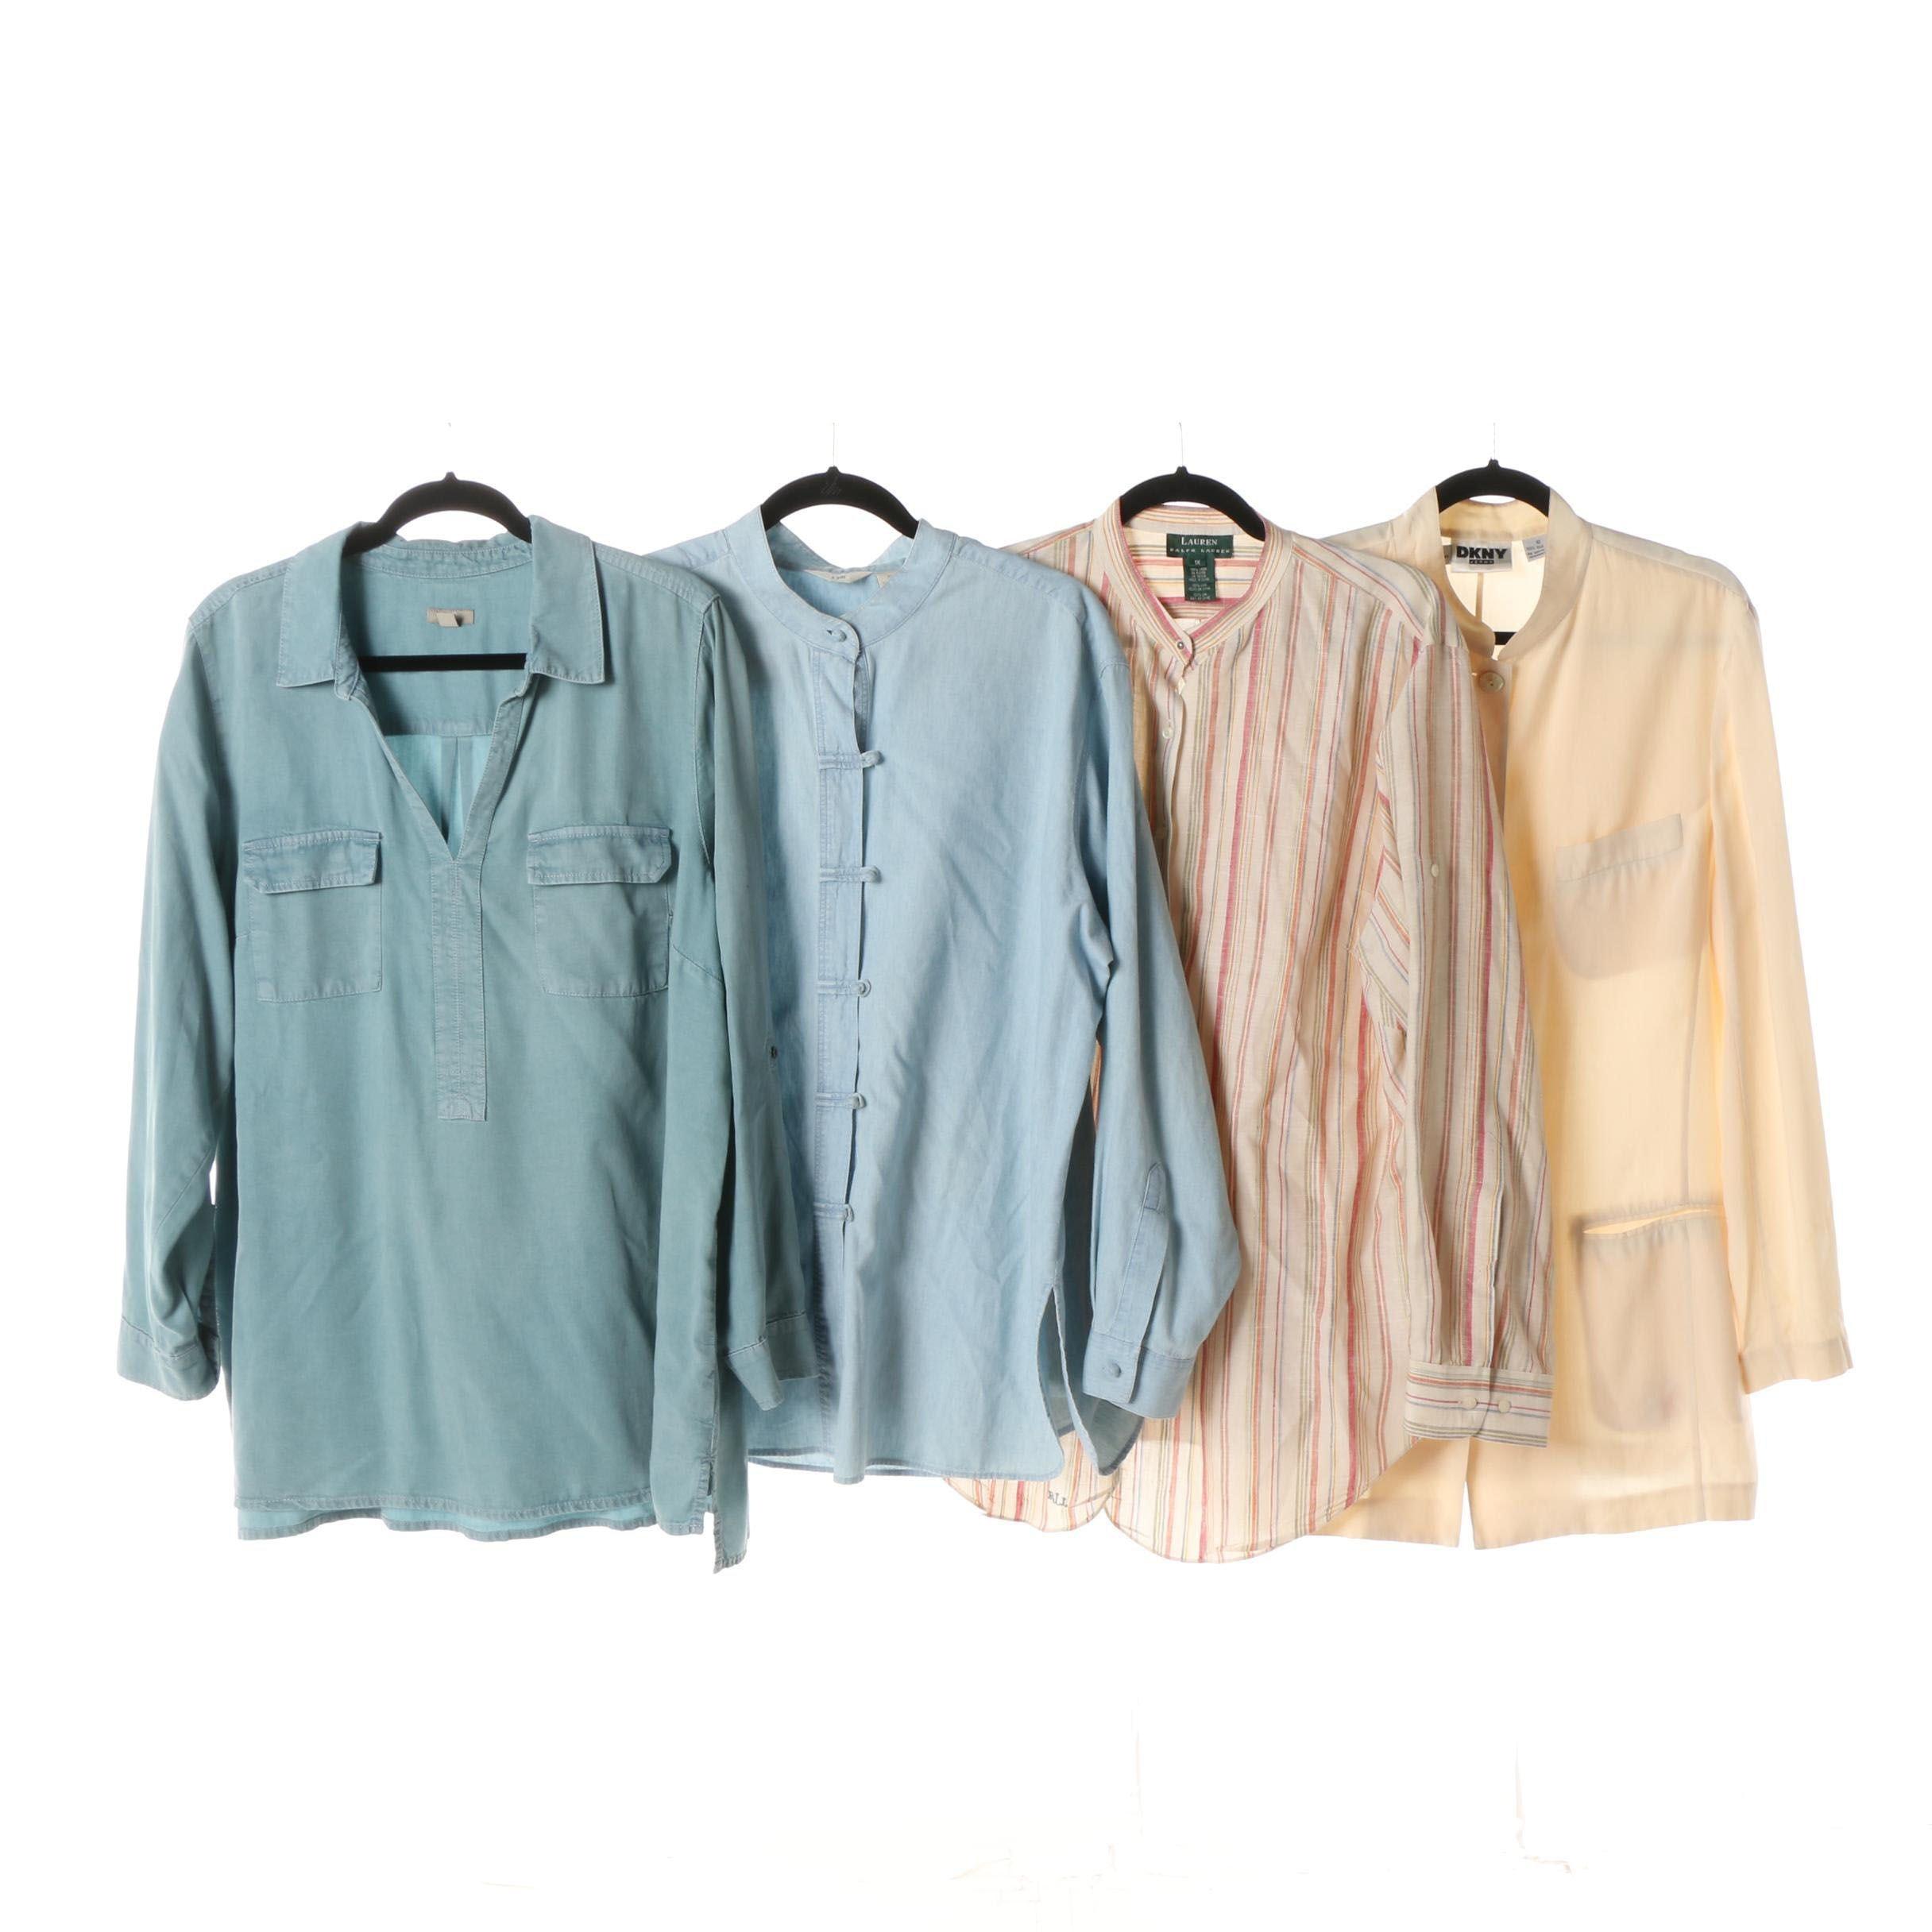 Women's J. Jill, DKNY Jeans and Lauren Ralph Lauren Tops and Jacket